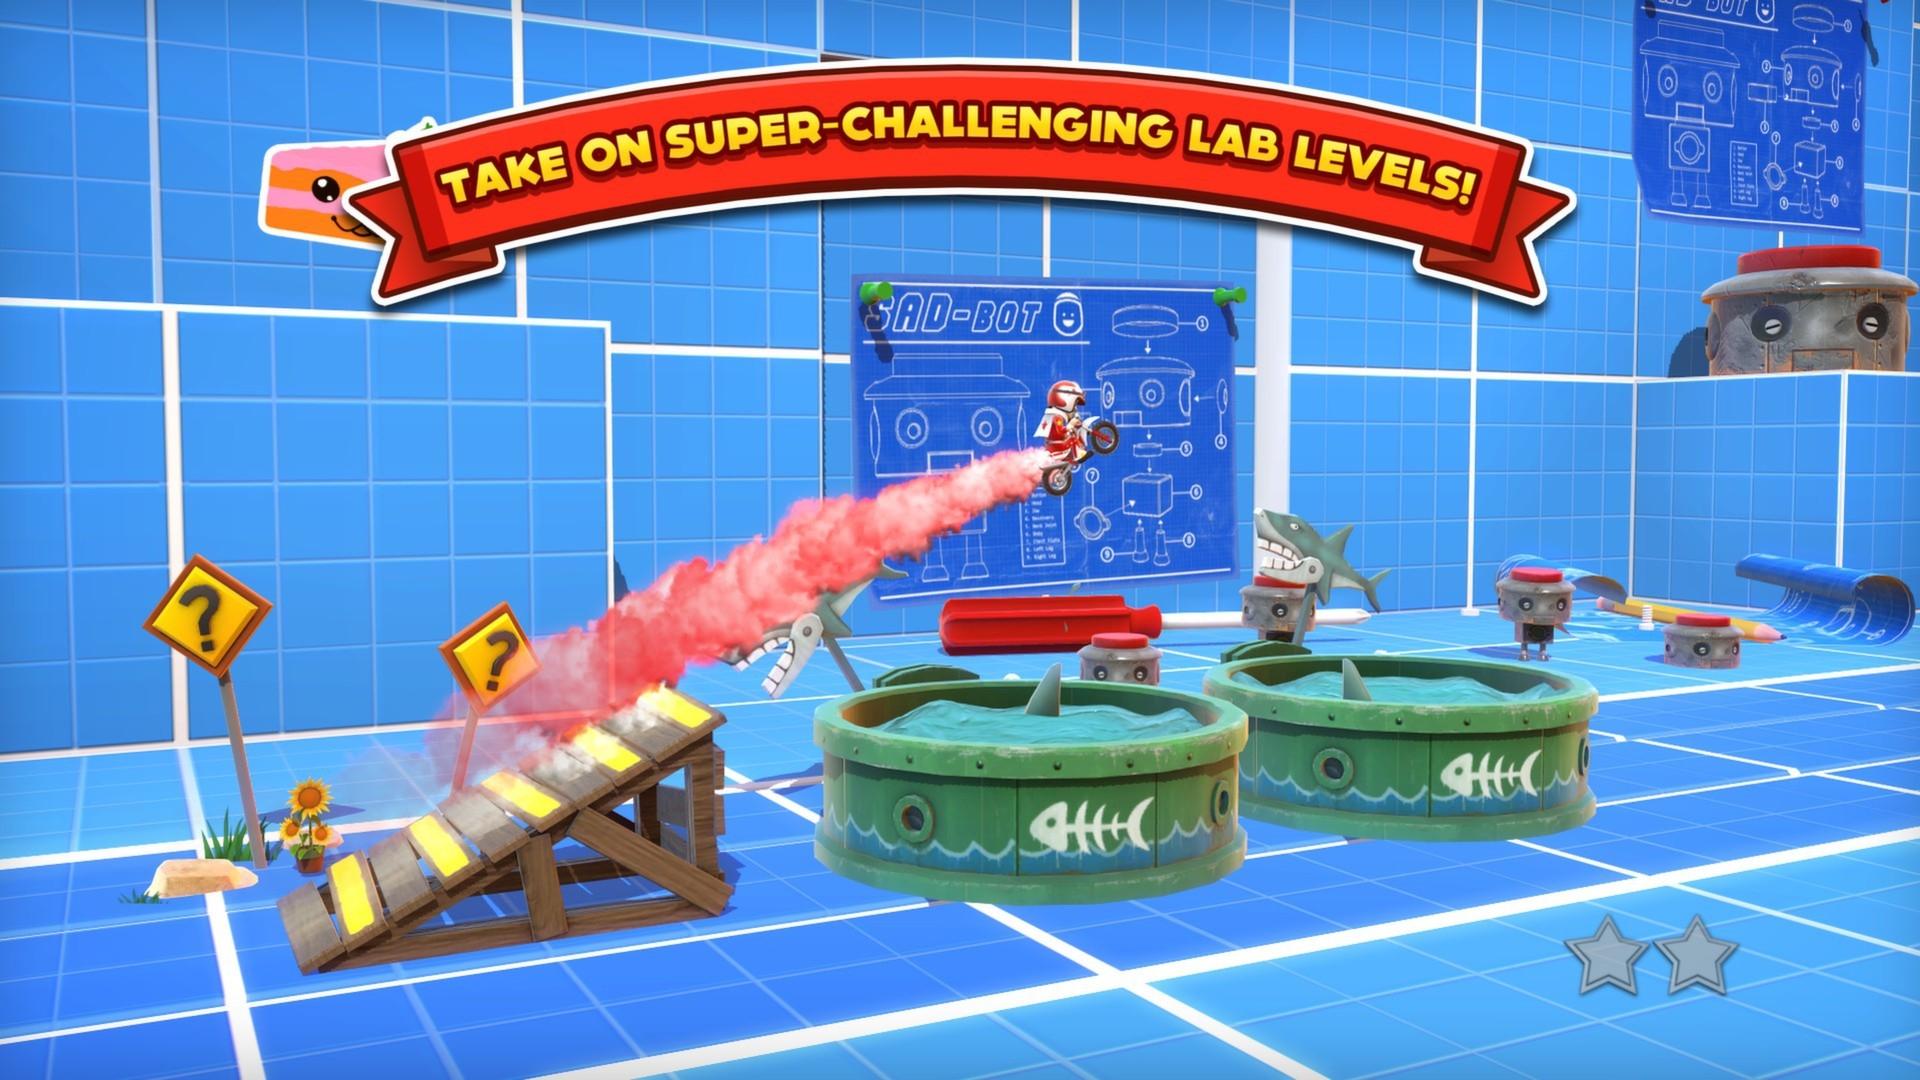 Joe Danger   WW (ed2c0a20-2792-4d1c-ac87-357ceeebbbab)